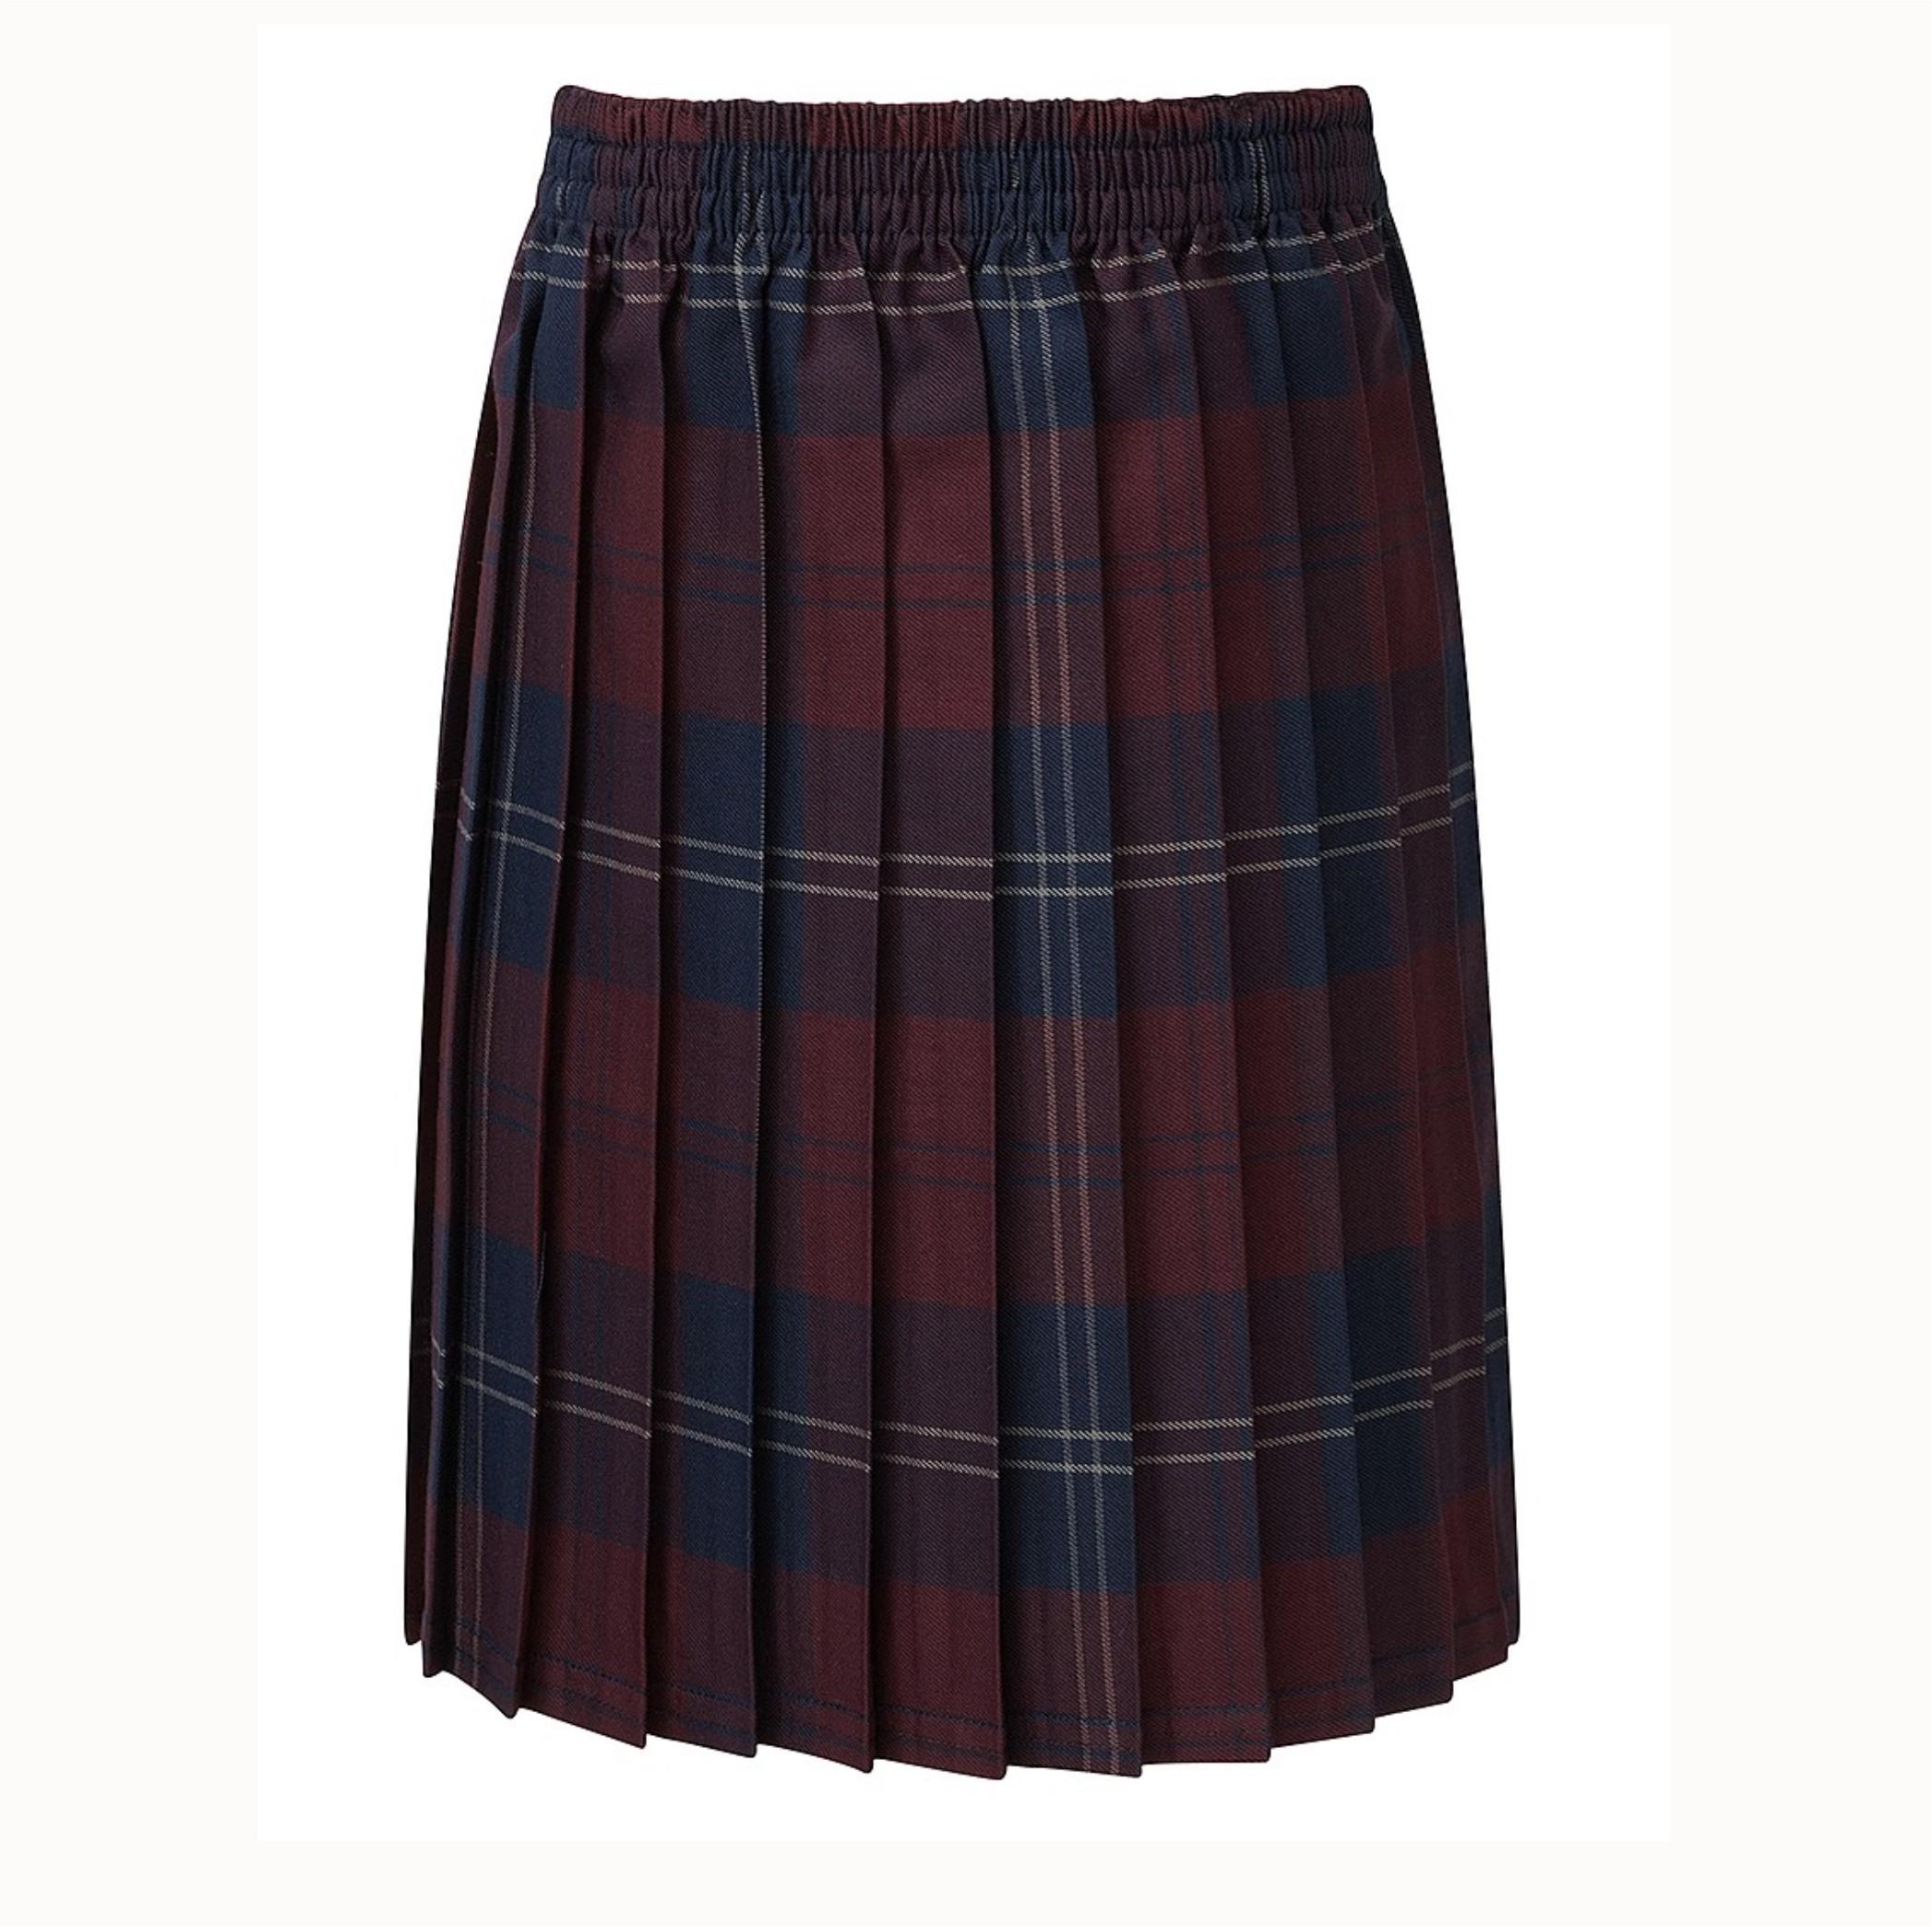 Skye Tartan Junior Maroon Skirt - Crested School Wear e9c565cb60844